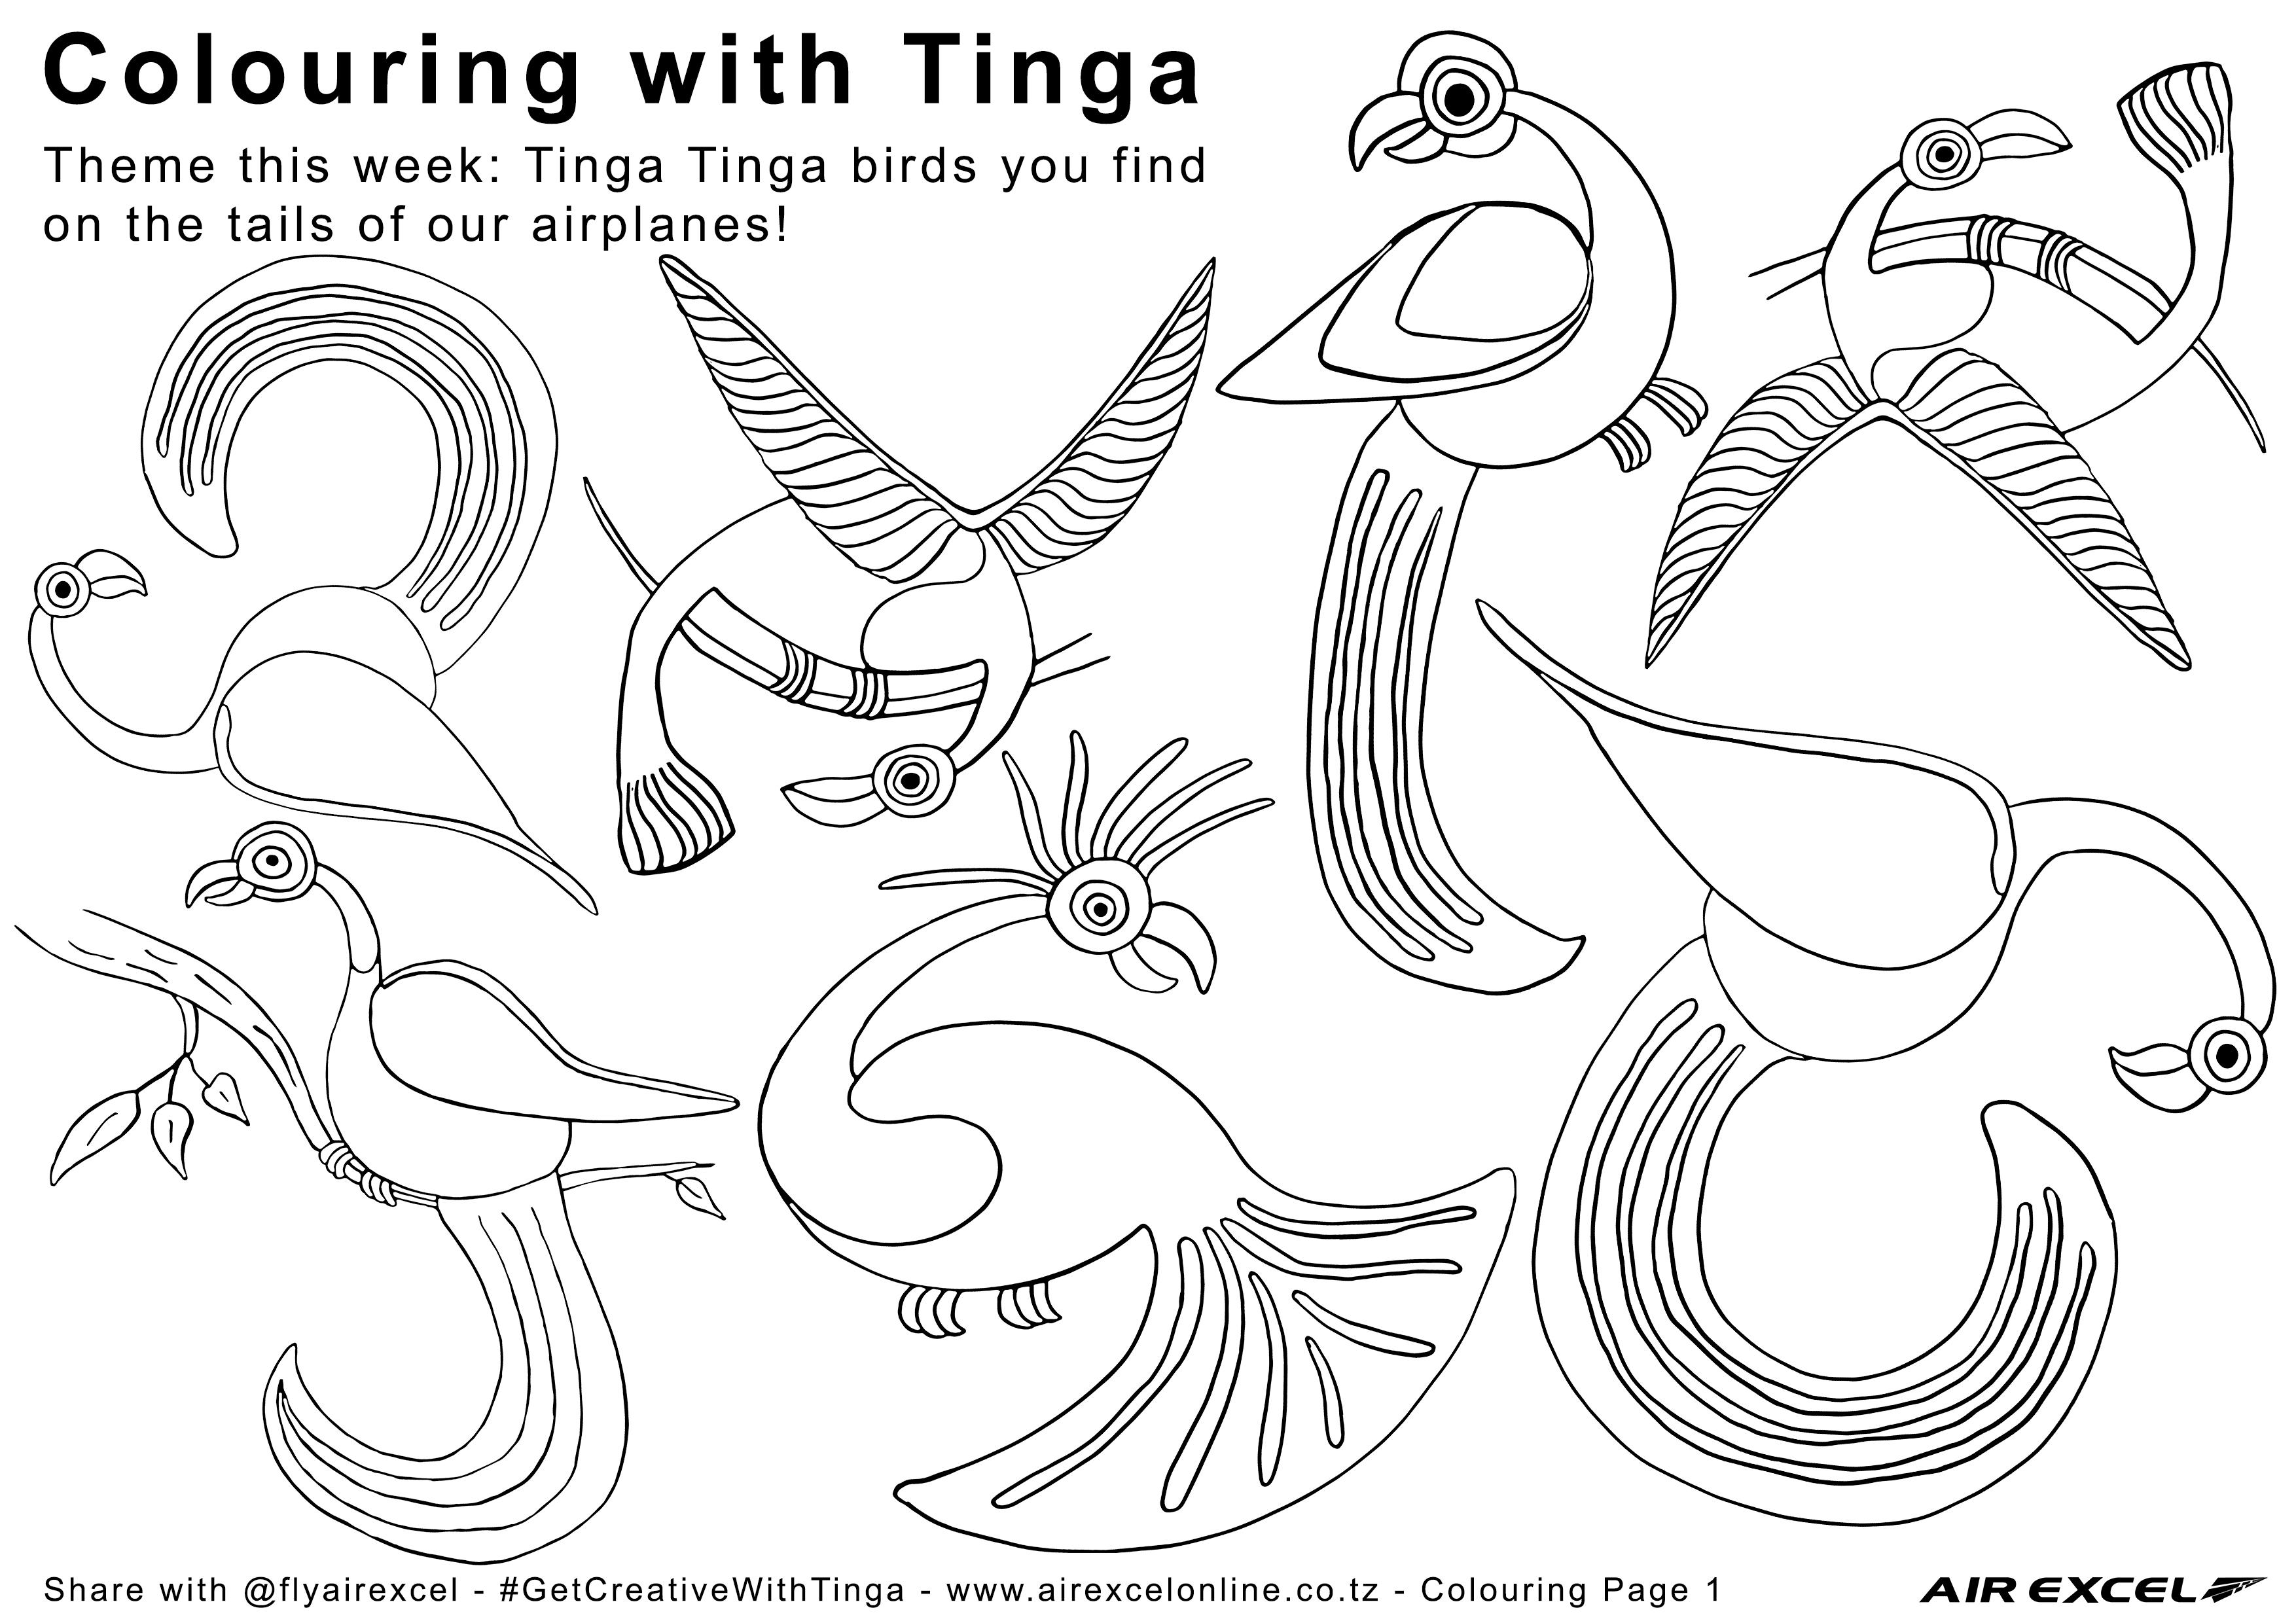 Air Excel Colouring Page 1 Tinga Tinga Birds